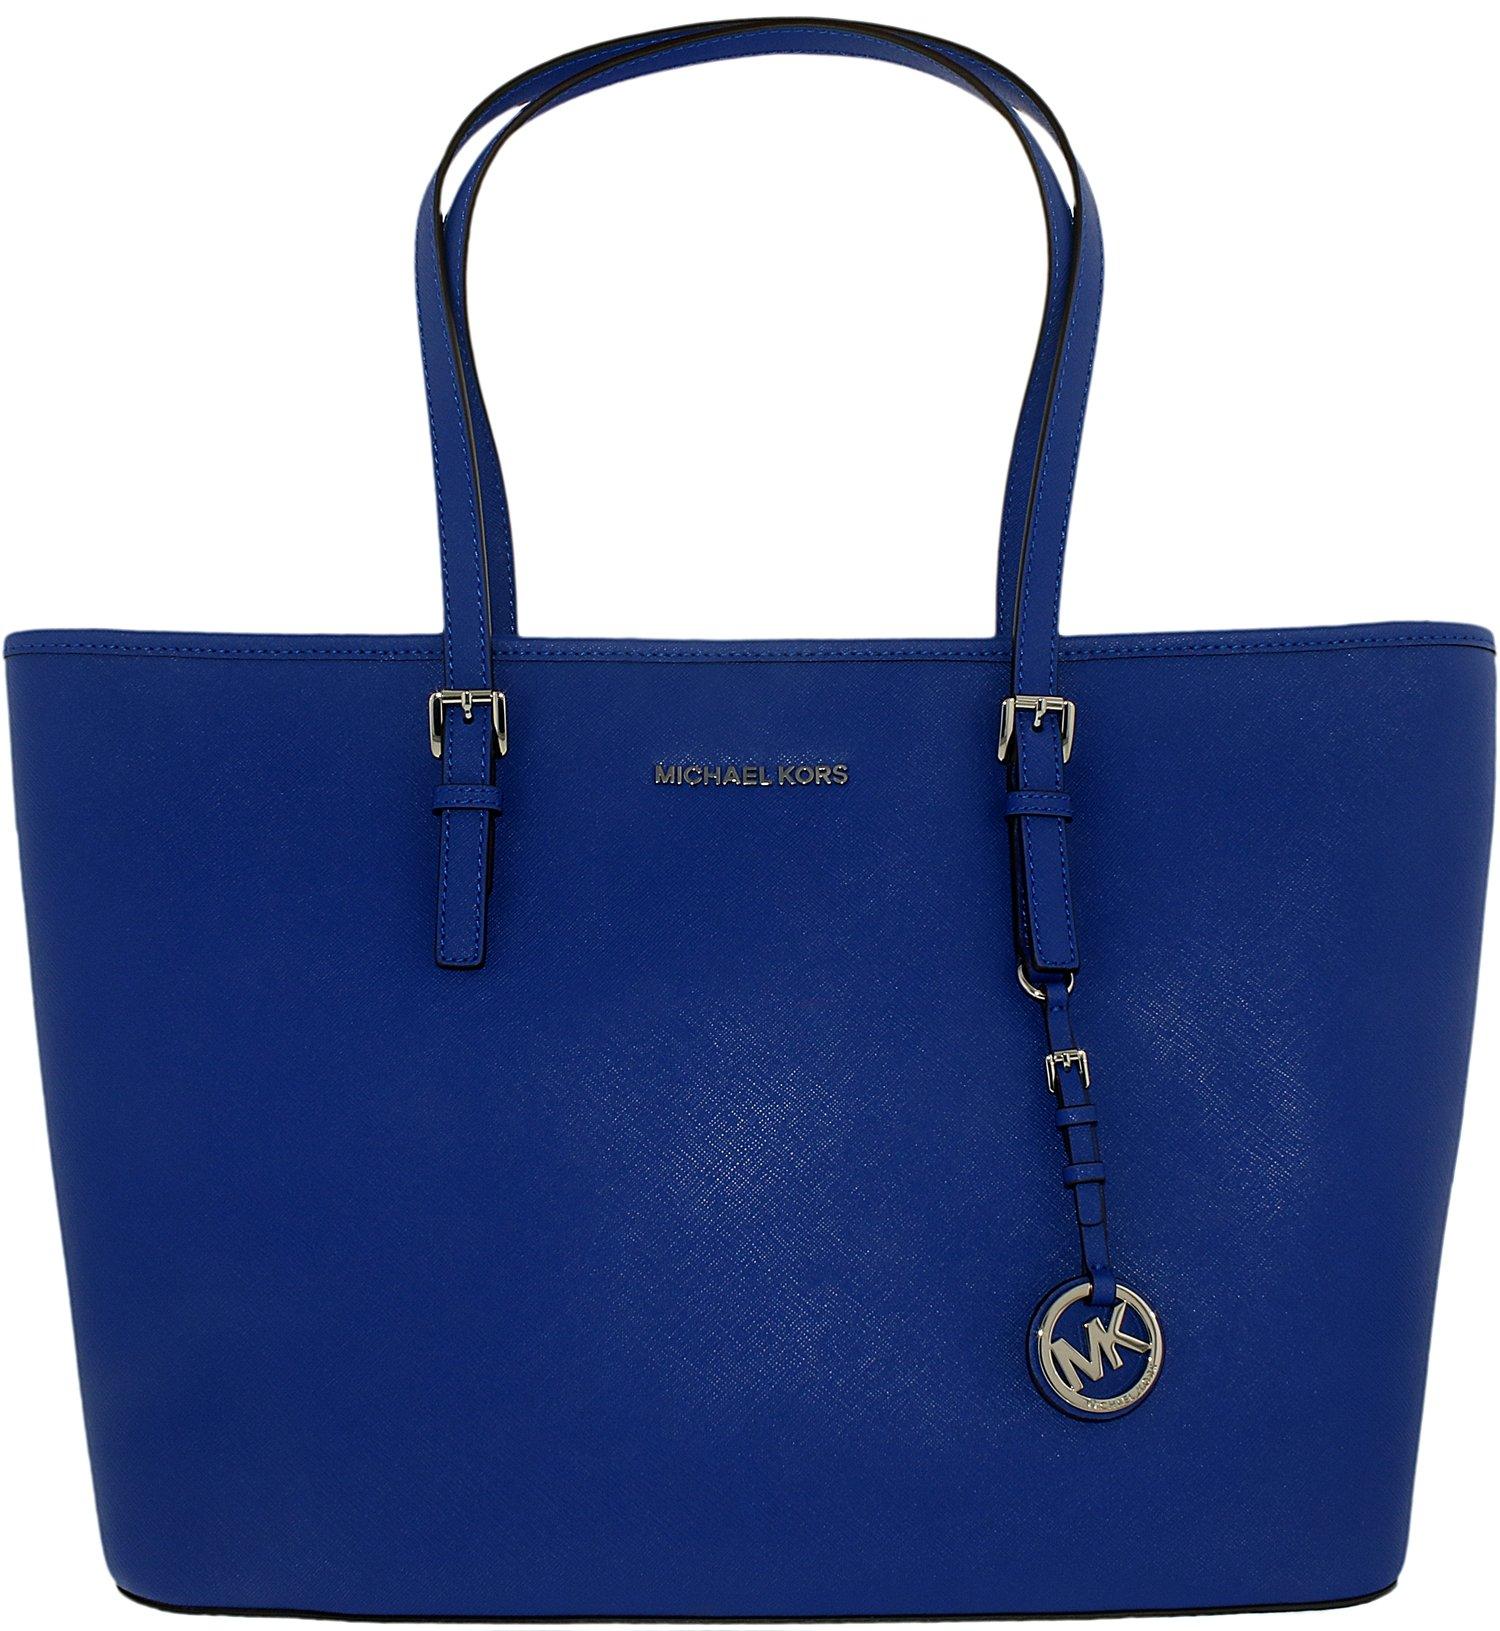 Michael Kors Women's Medium Jet Set Travel Saffiano Bag Leather Shoulder Tote - Electric Blue by MICHAEL Michael Kors